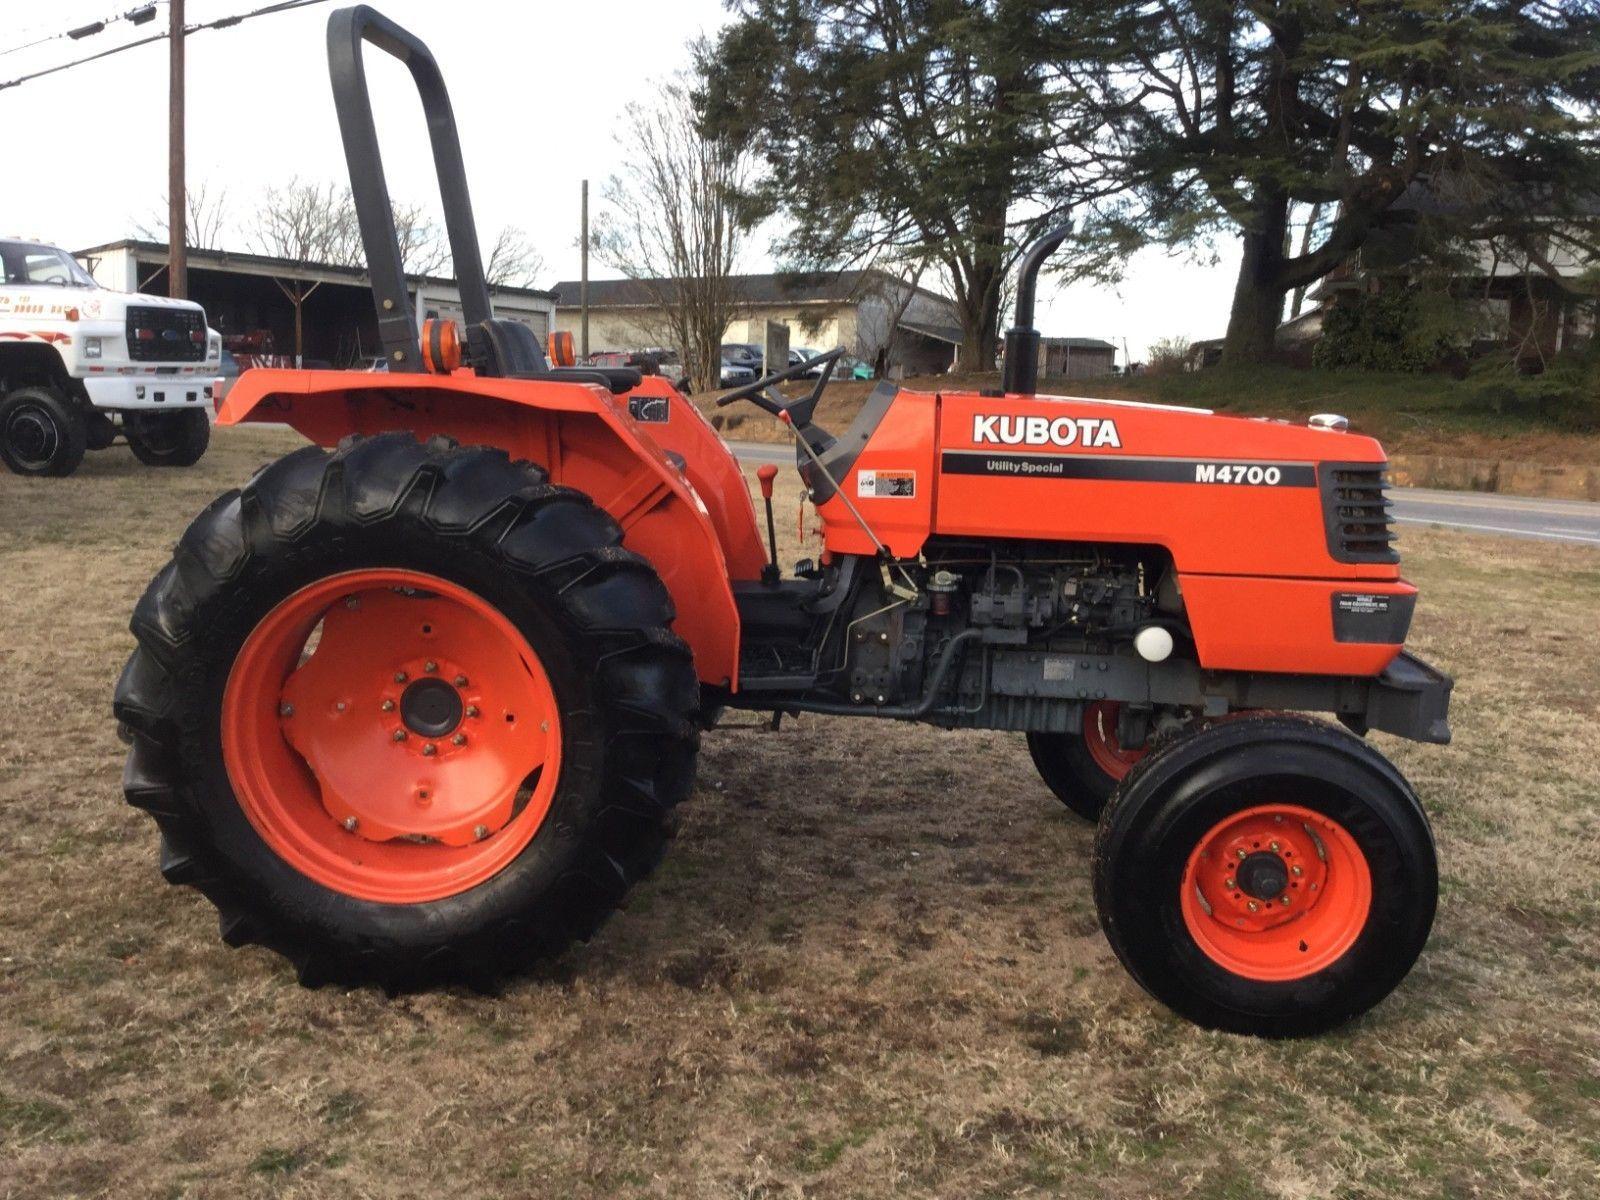 iVery Nice Kubota M4700 2WD-Traktor mit nur 555 Stunden